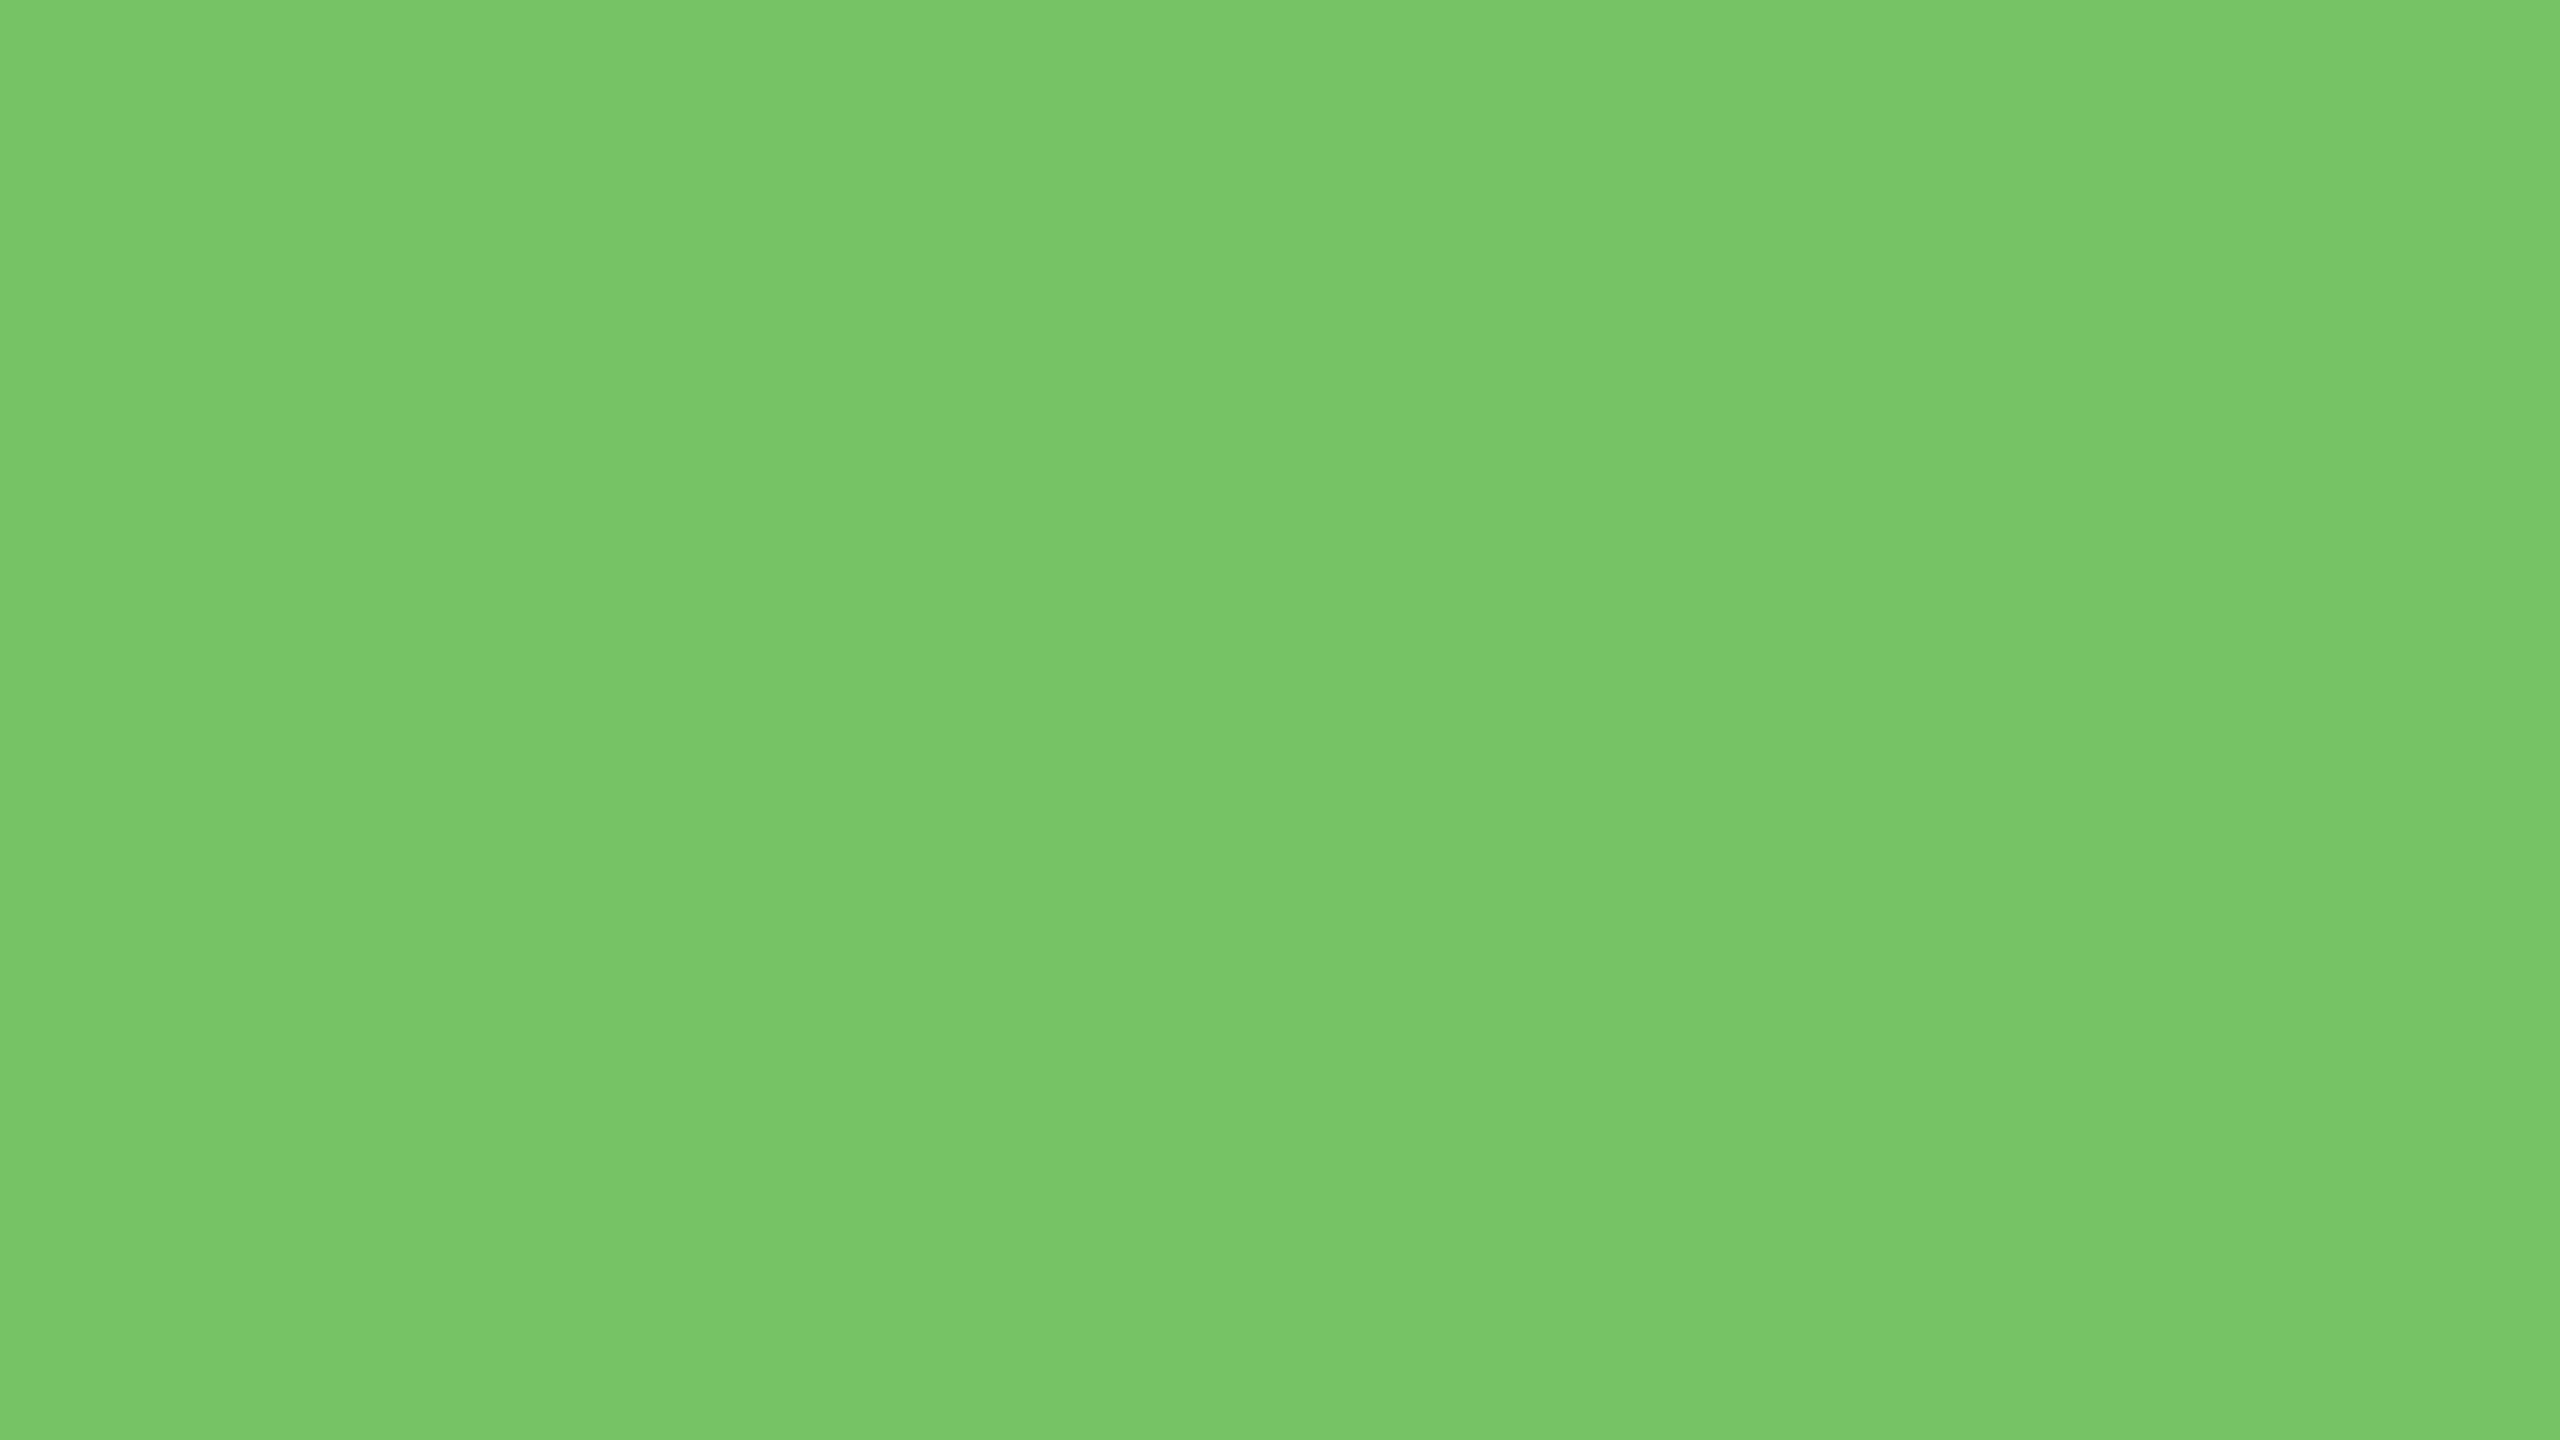 2560x1440 Mantis Solid Color Background